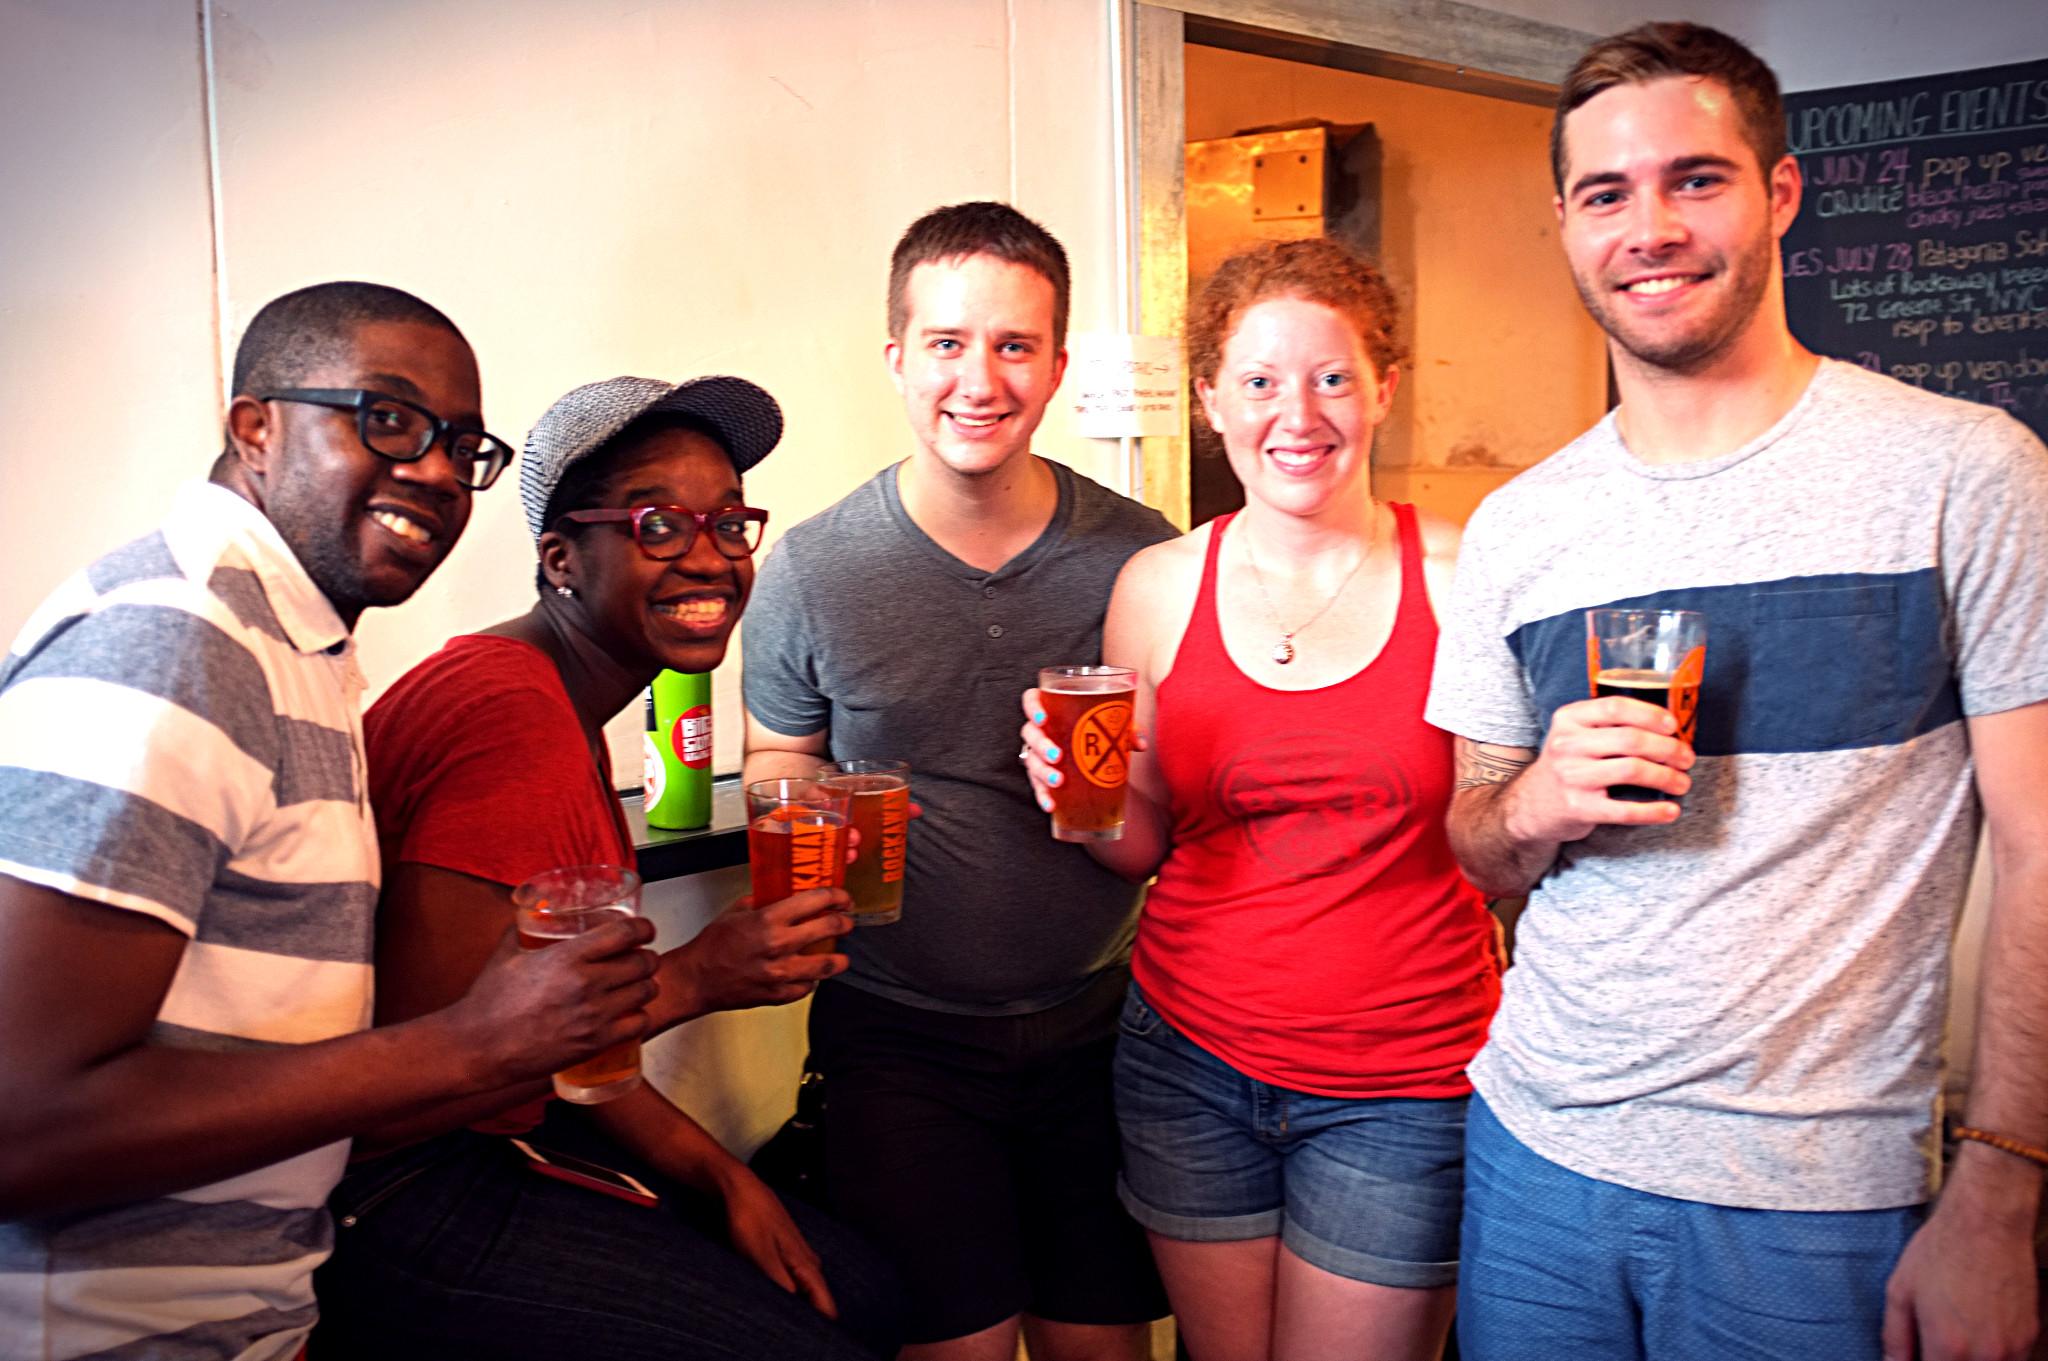 From left to right:  Beer 7: ESB. Beer 8: ESB. Beer 9: Pharm. Beer 10: ESB. Beer 11: Night Hop